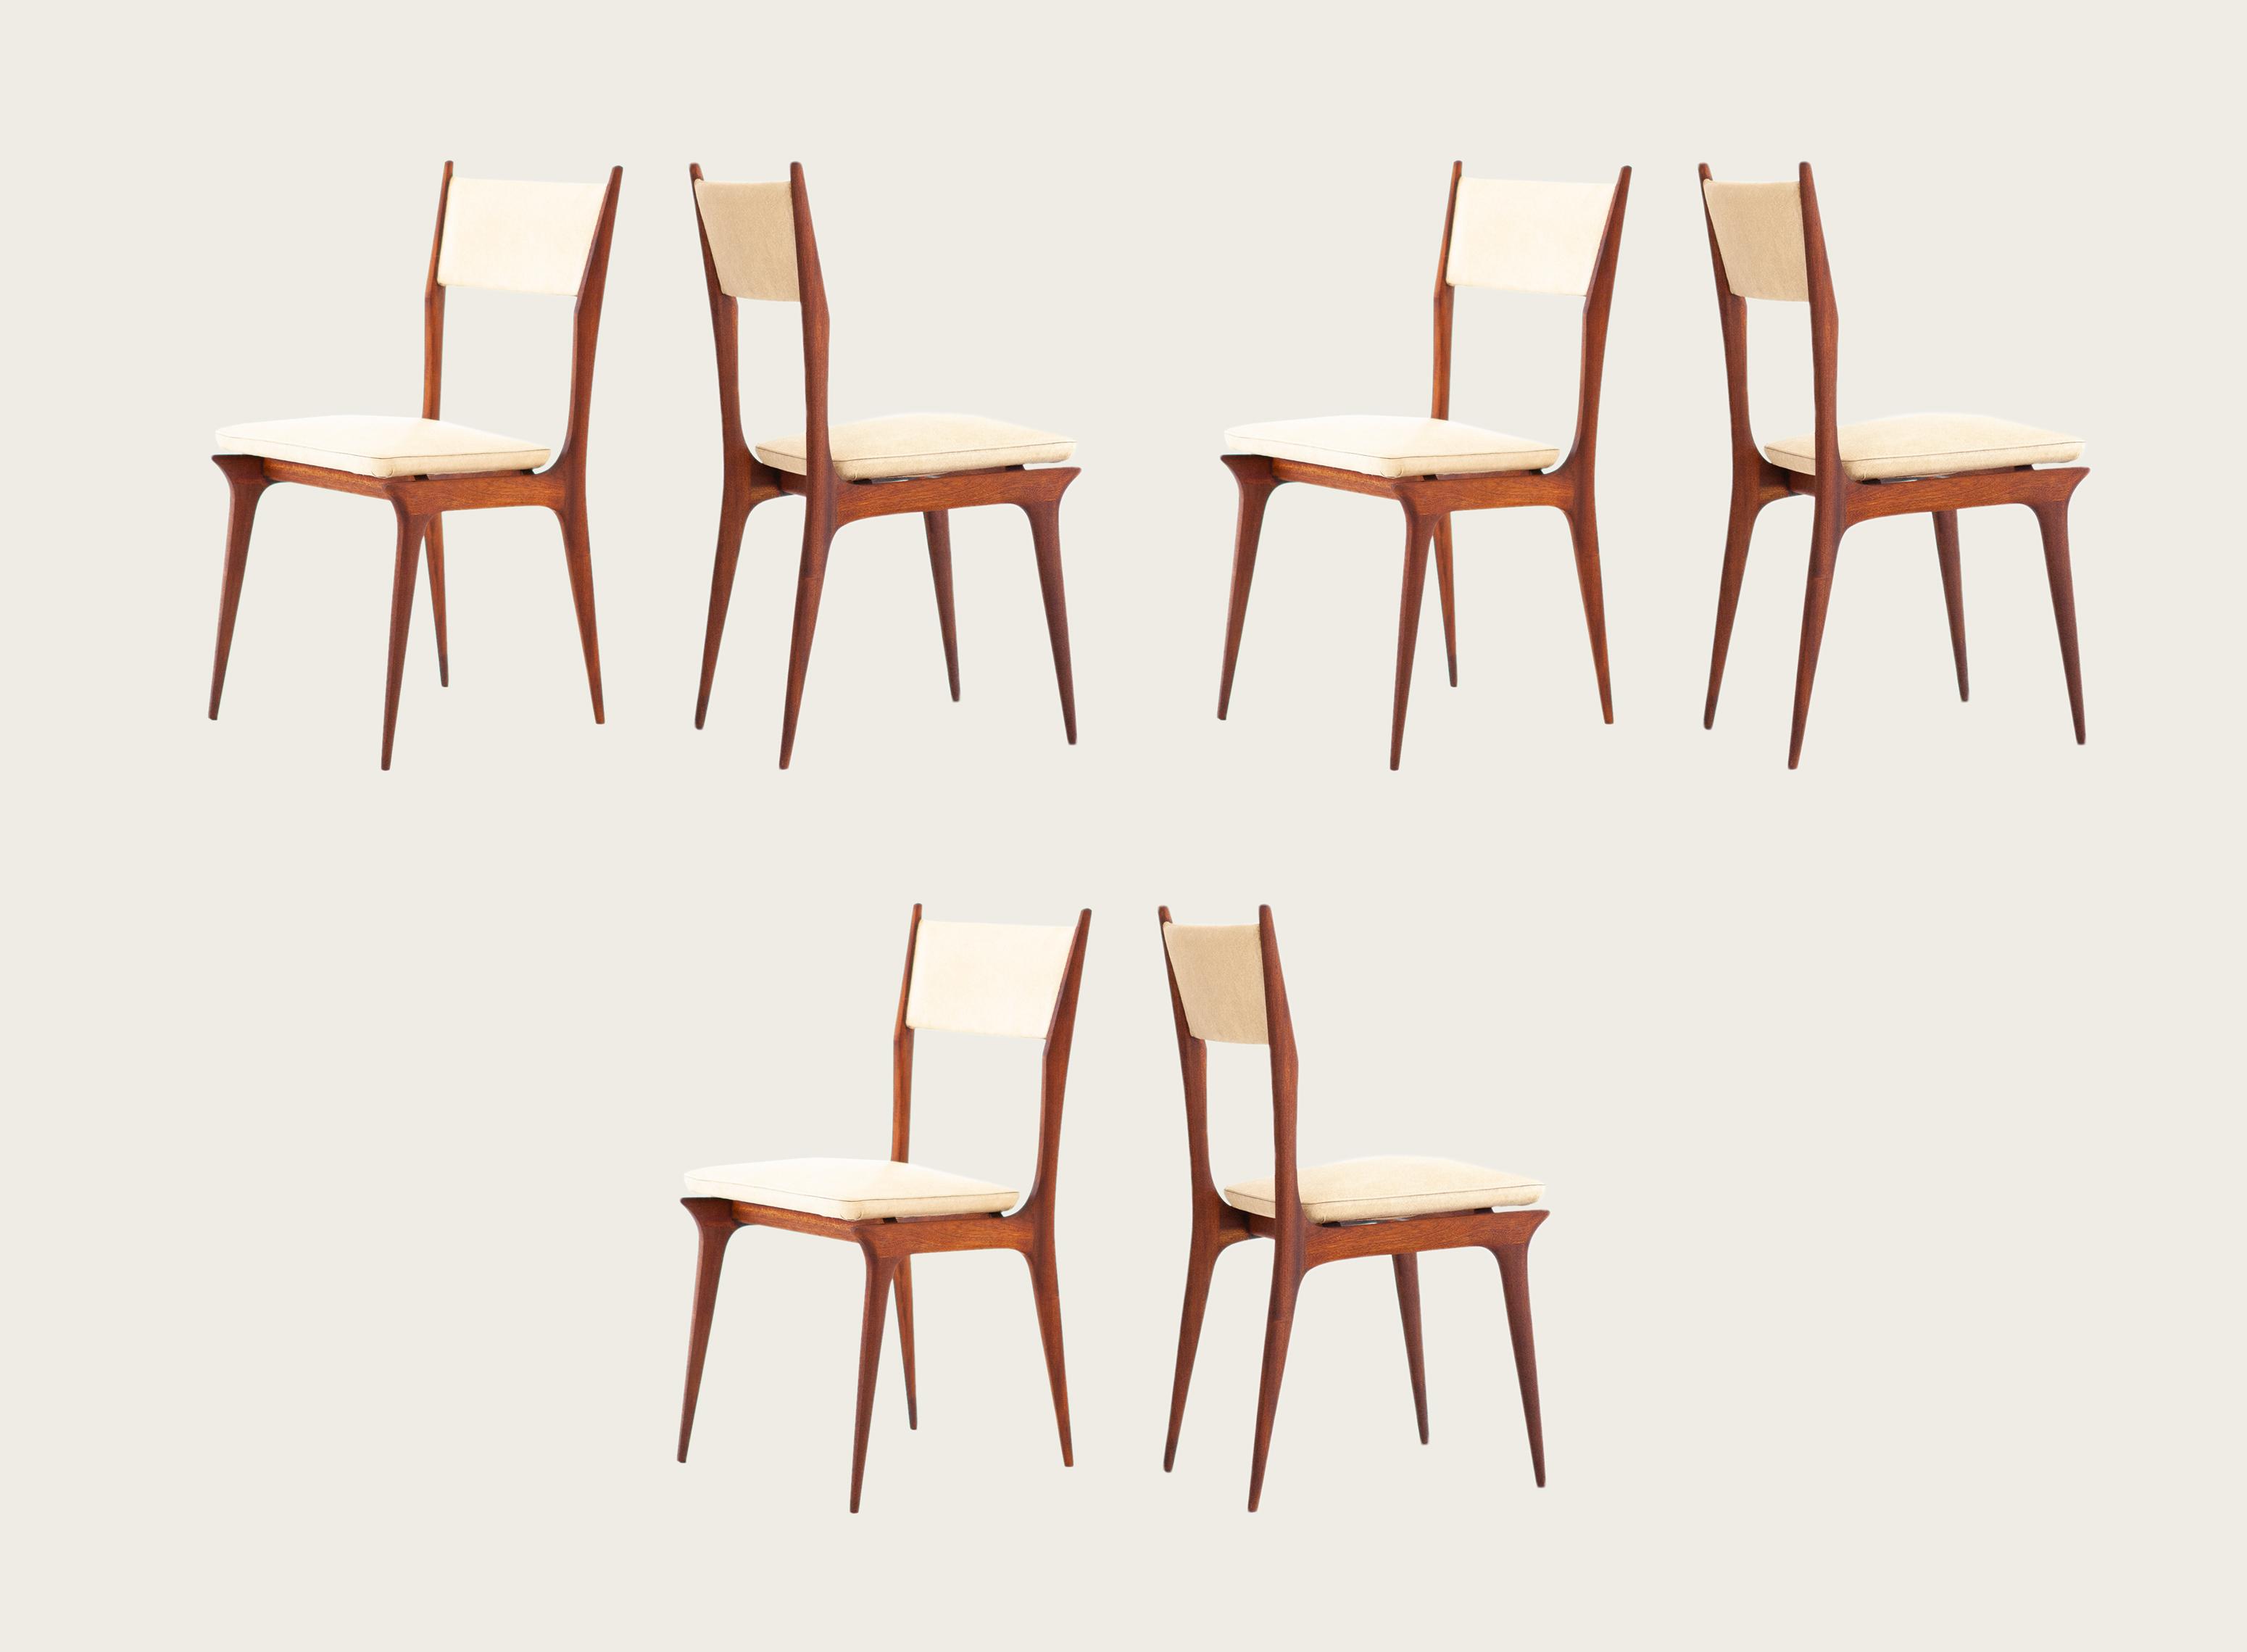 six-italian-mahogany-beige-skai-dining-chairs-9-SE281